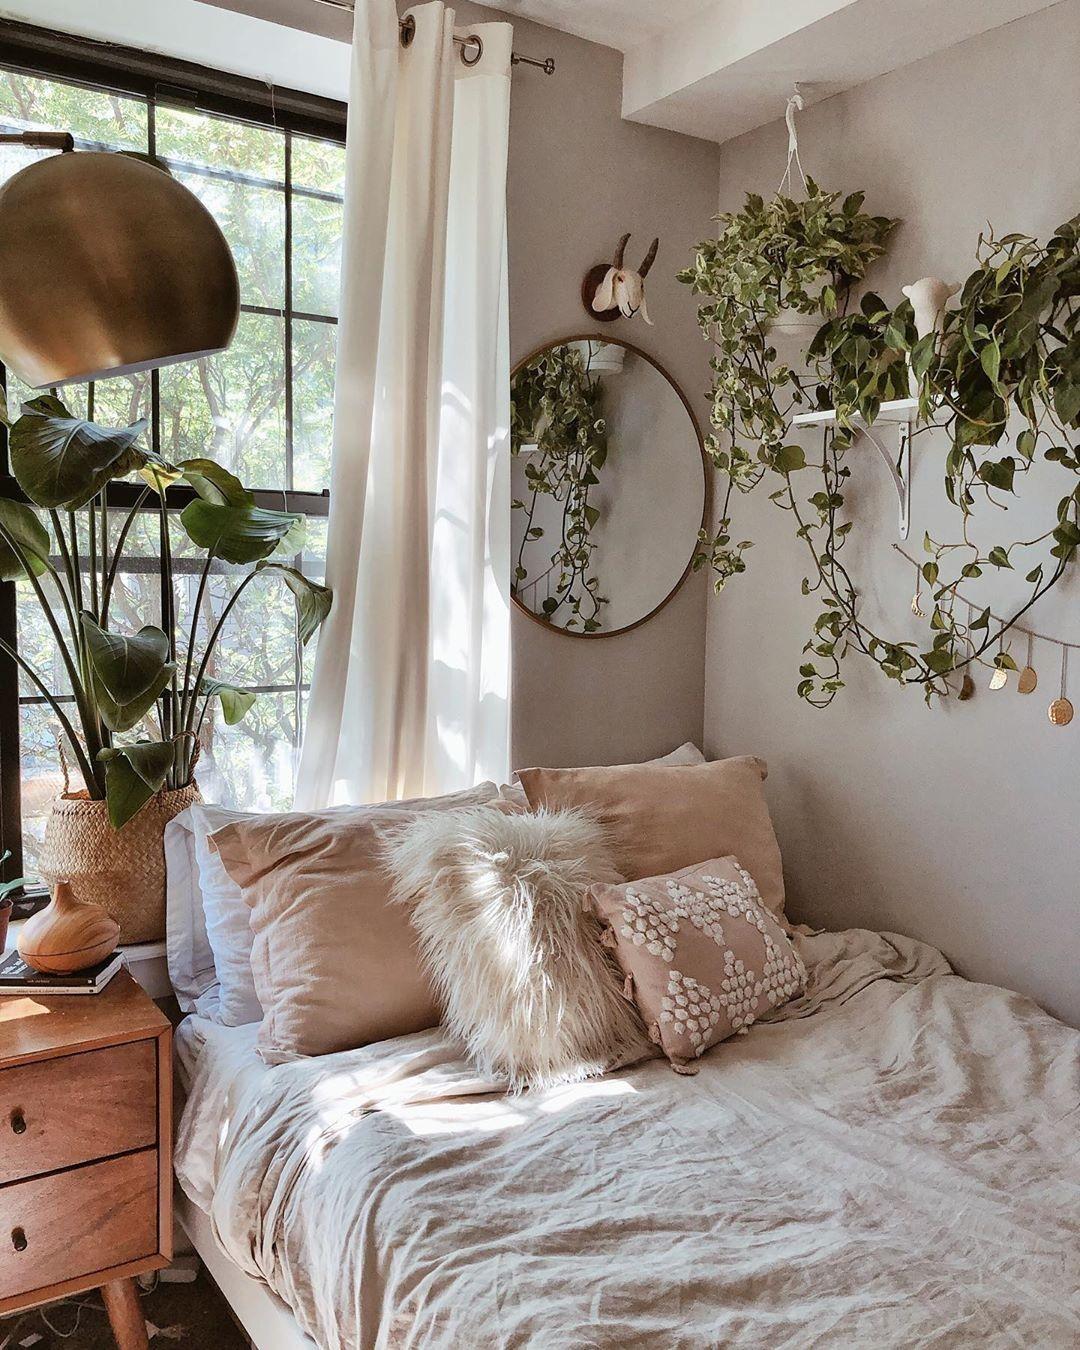 Boho Style Ideas For Bedroom Decors Aesthetic Bedroom Boho Chic